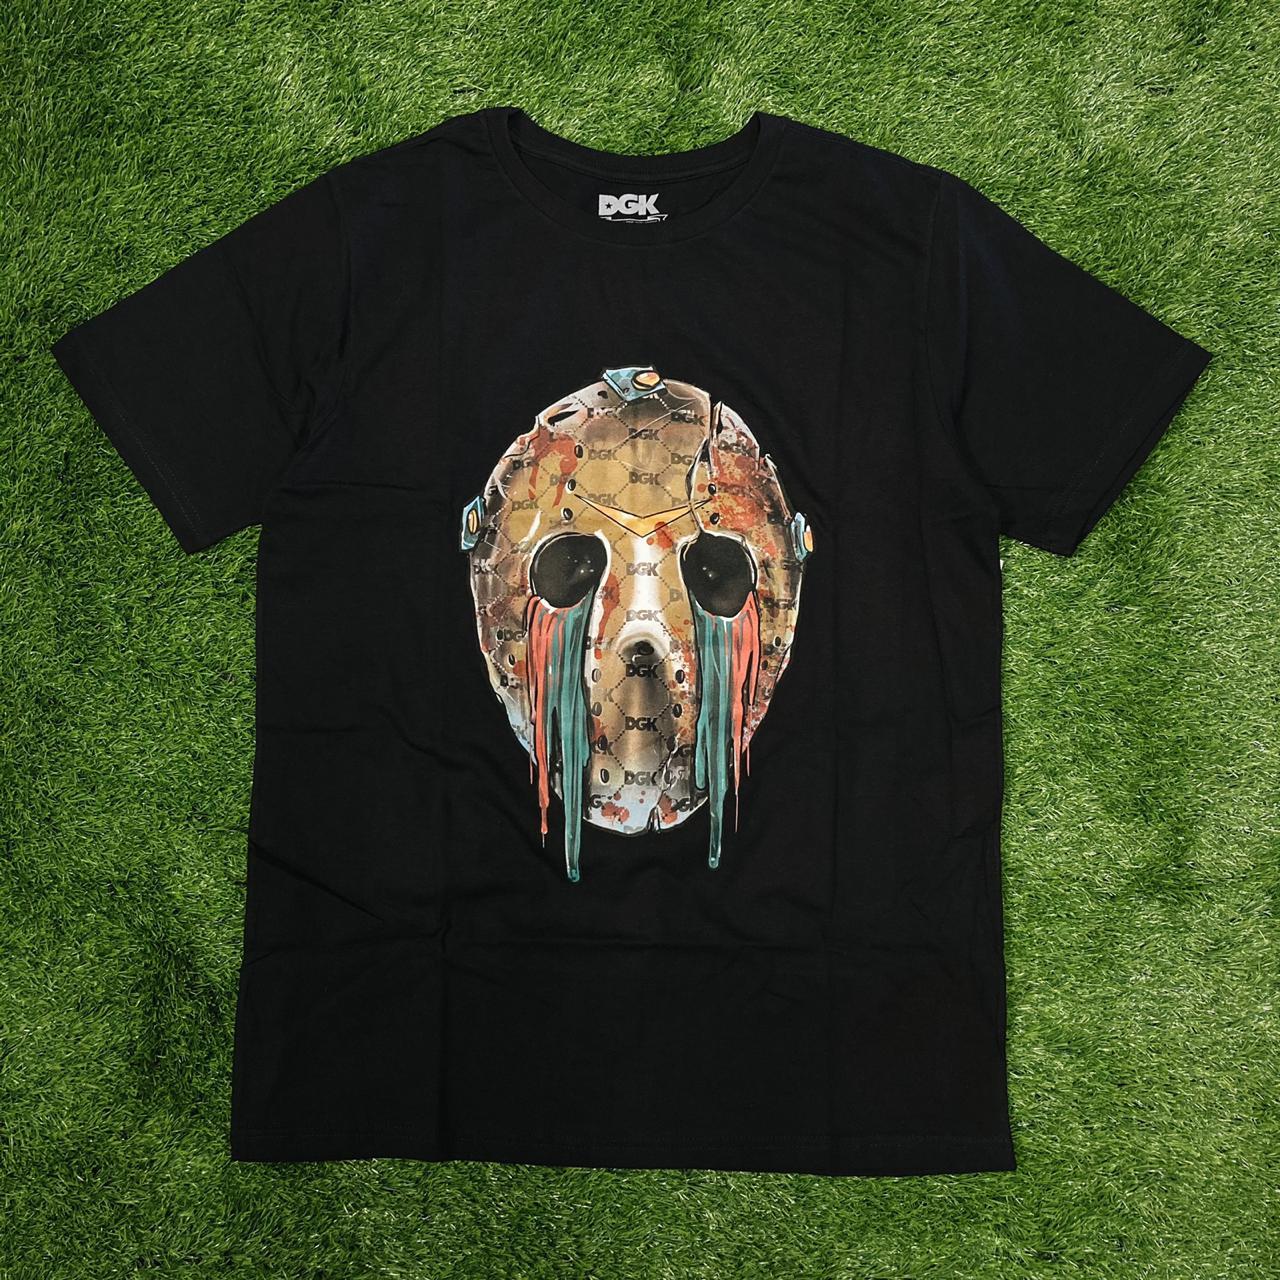 Camiseta dgk hooligan black